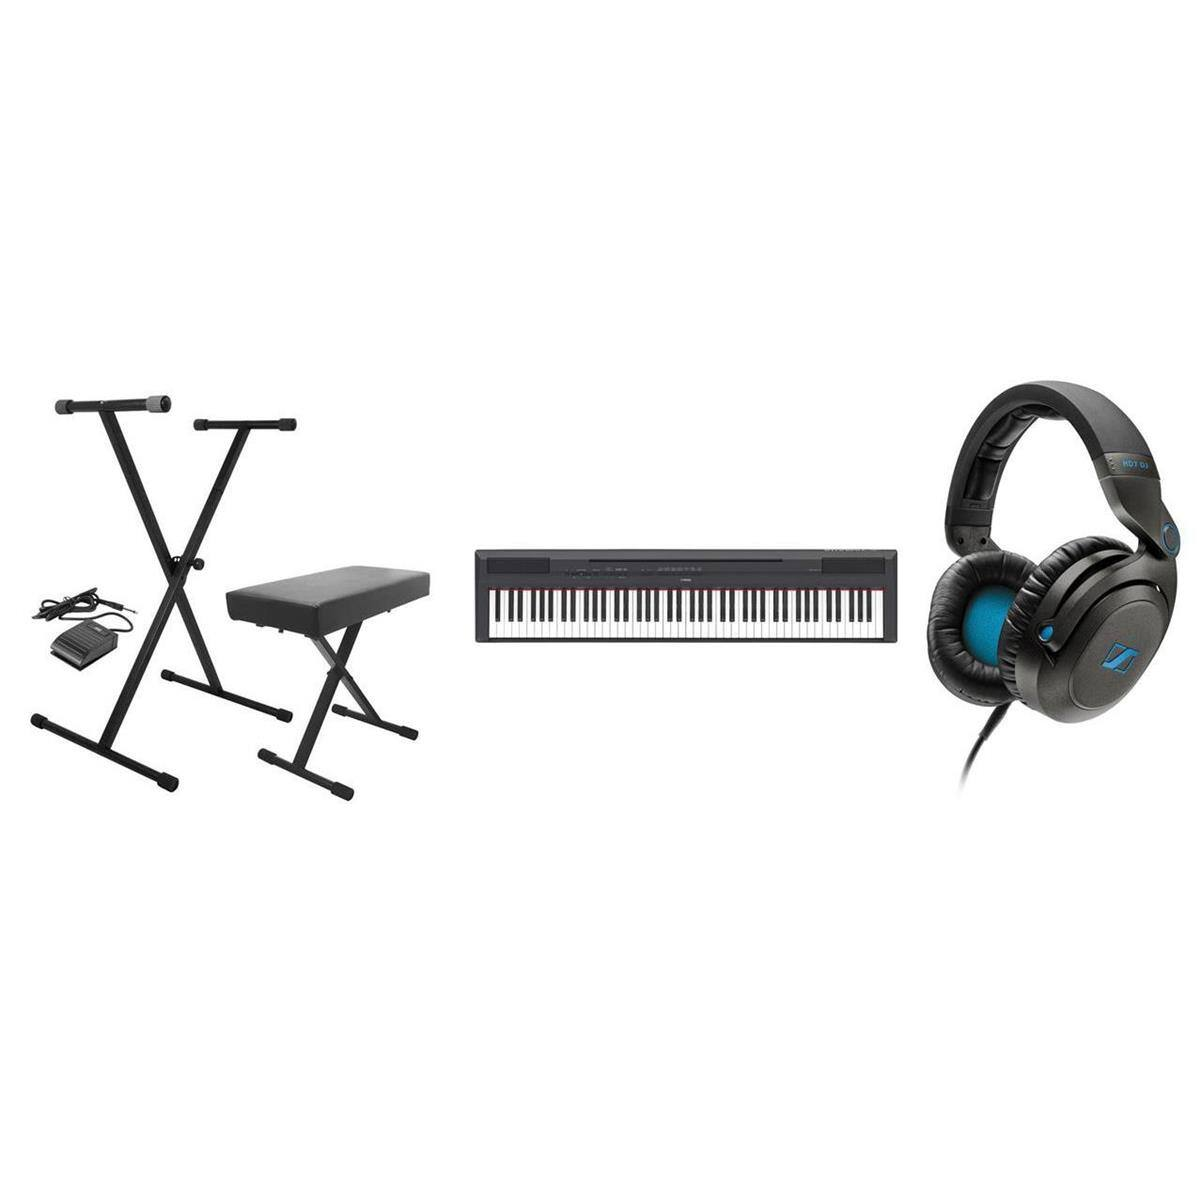 Yamaha P-115 88-Key Digital Piano + Sennheiser HD7 Headphones + Stand & Bench  $600 + Free Shipping